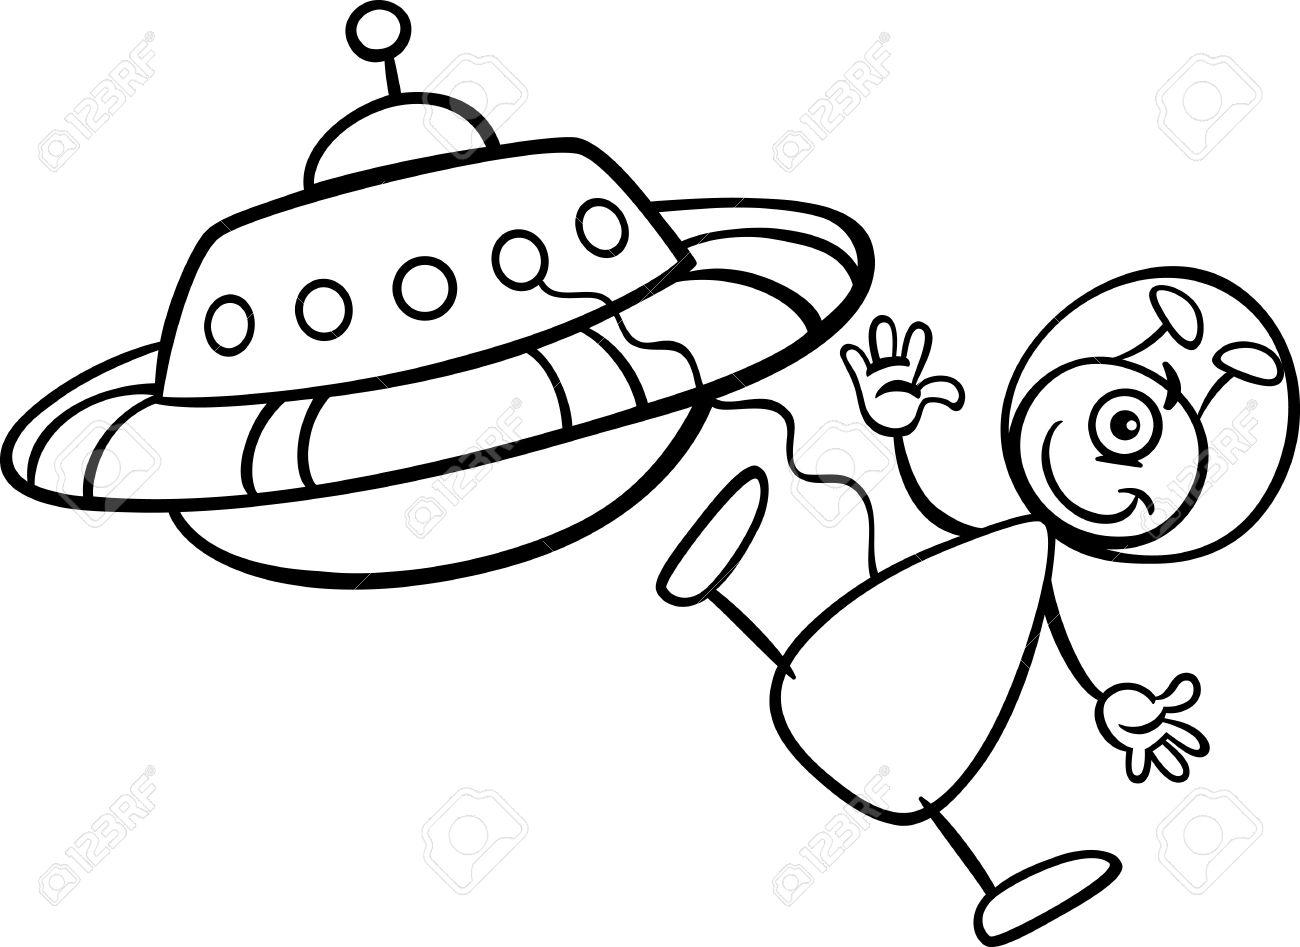 1300x947 Alien Spaceship Clipart Black And White